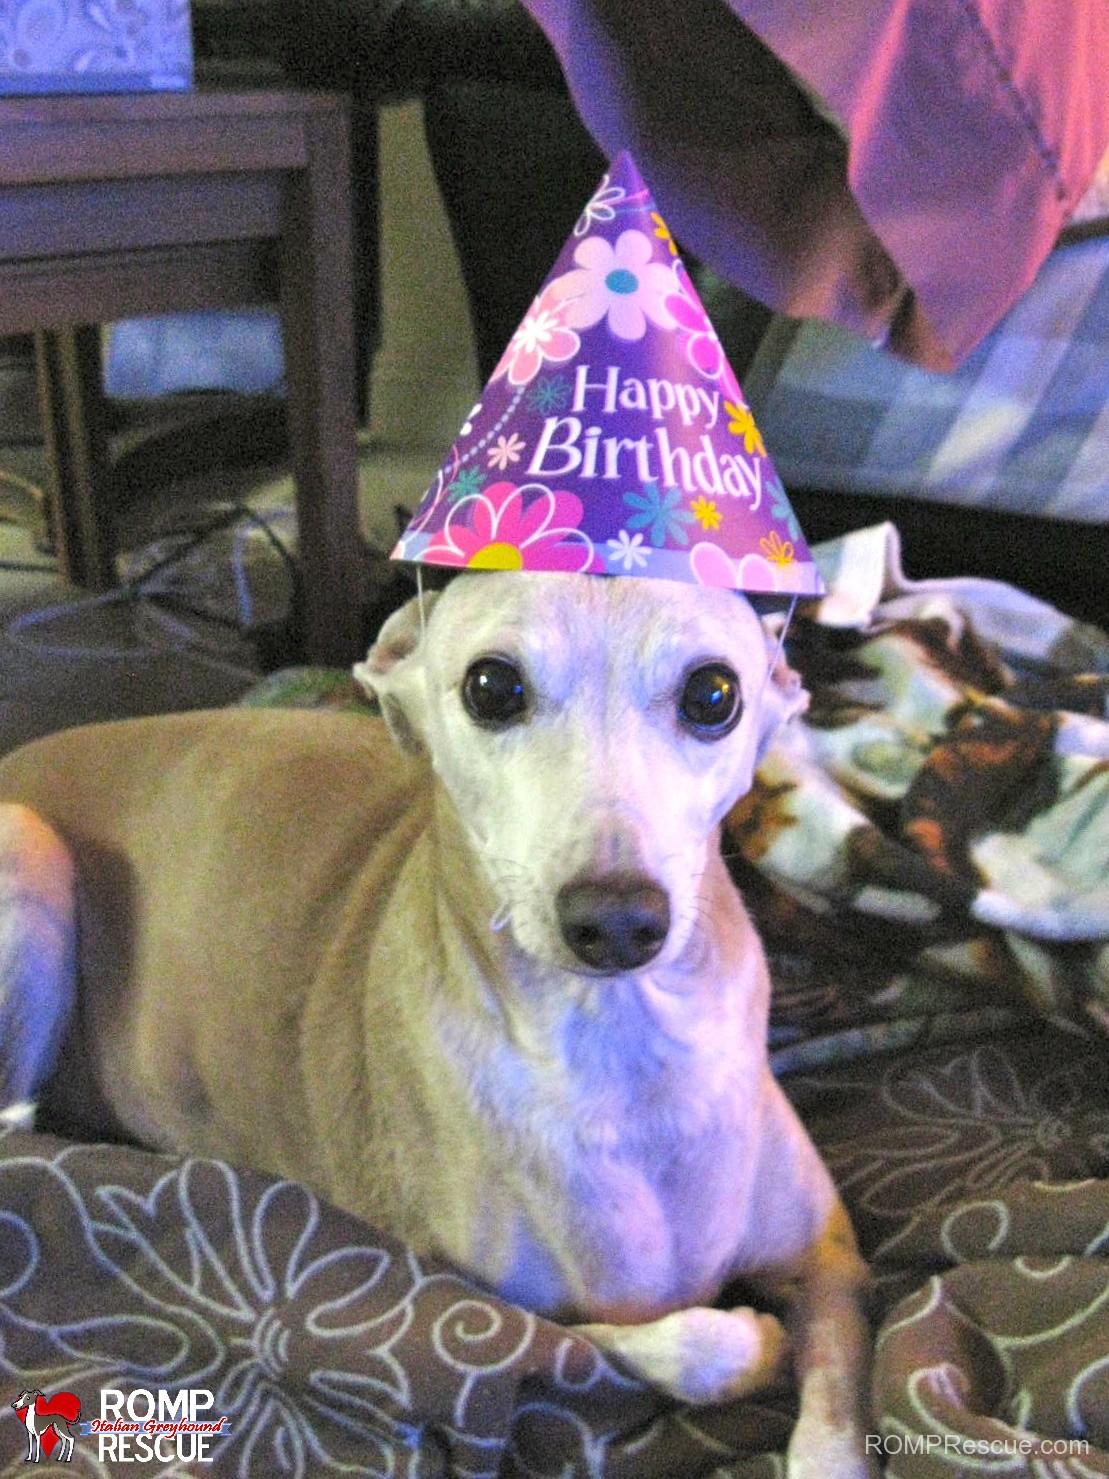 italian greyhounds celebrating their birthday, birthday, italian greyhound, hat, celebrate, italian, greyhound, happy, party, gotcha day, day, birth, born, adoption